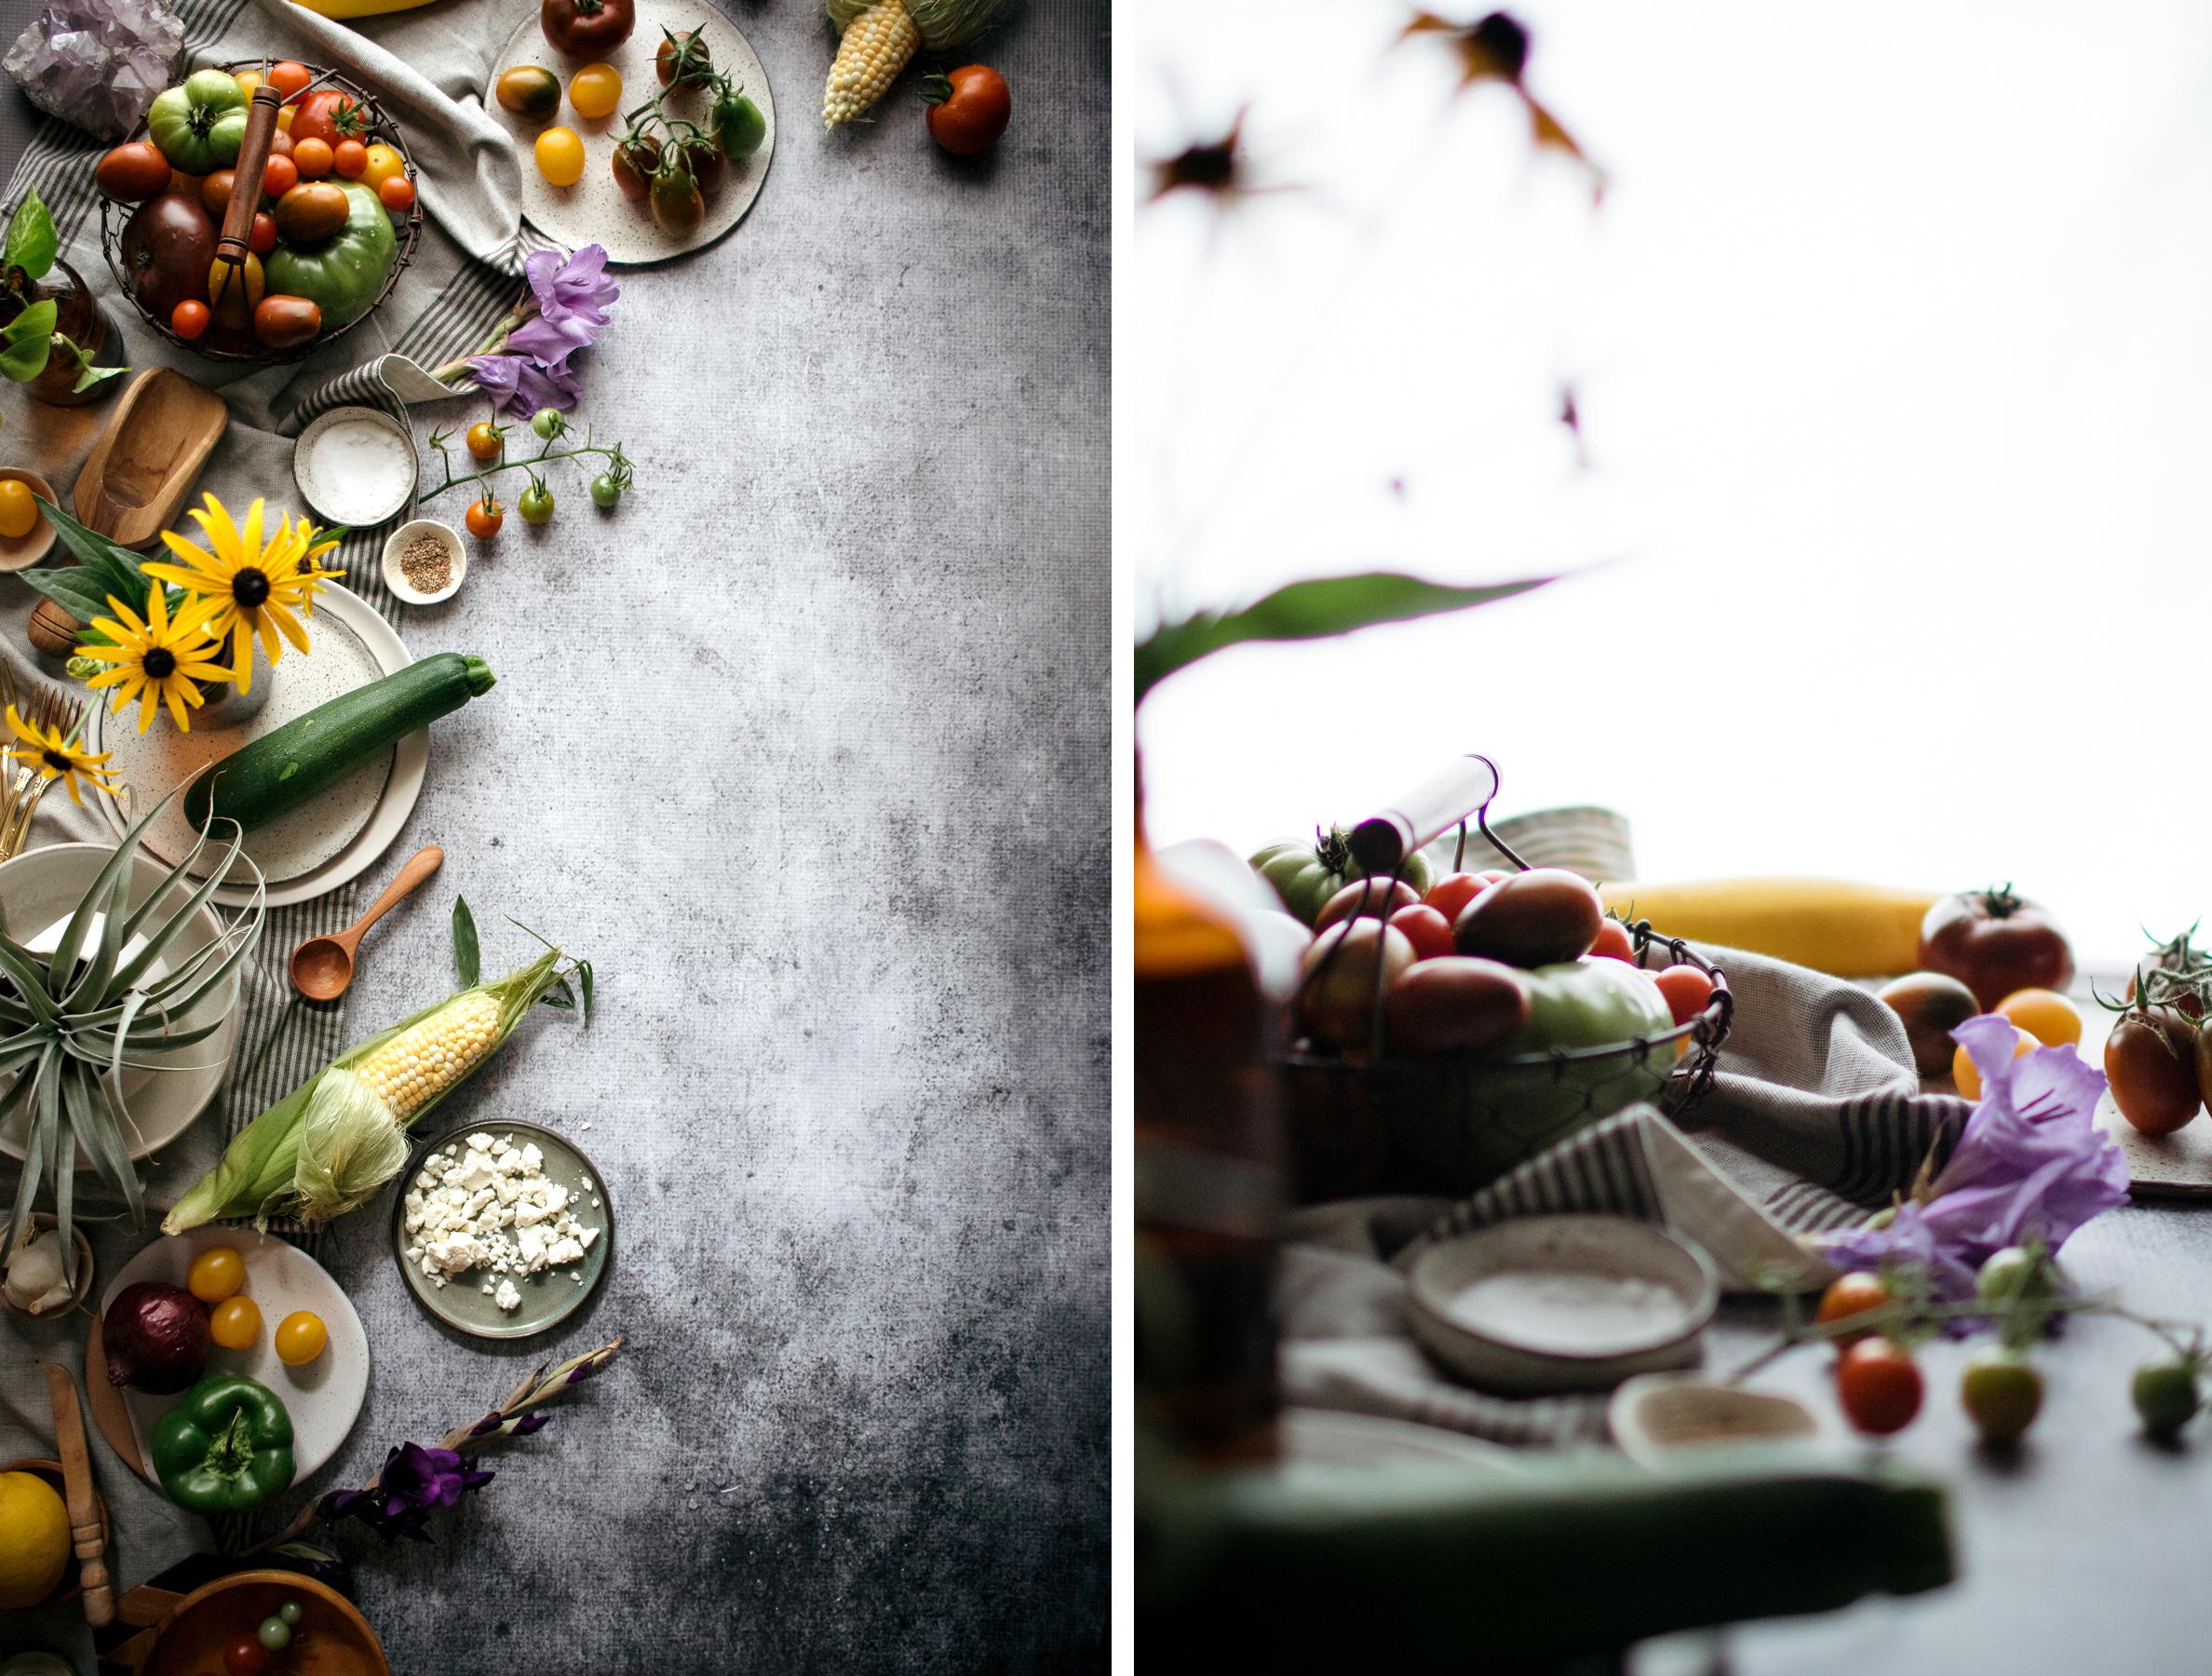 Vegetarian Garden Tart With Roasted Red Pepper & Feta Spread Recipe